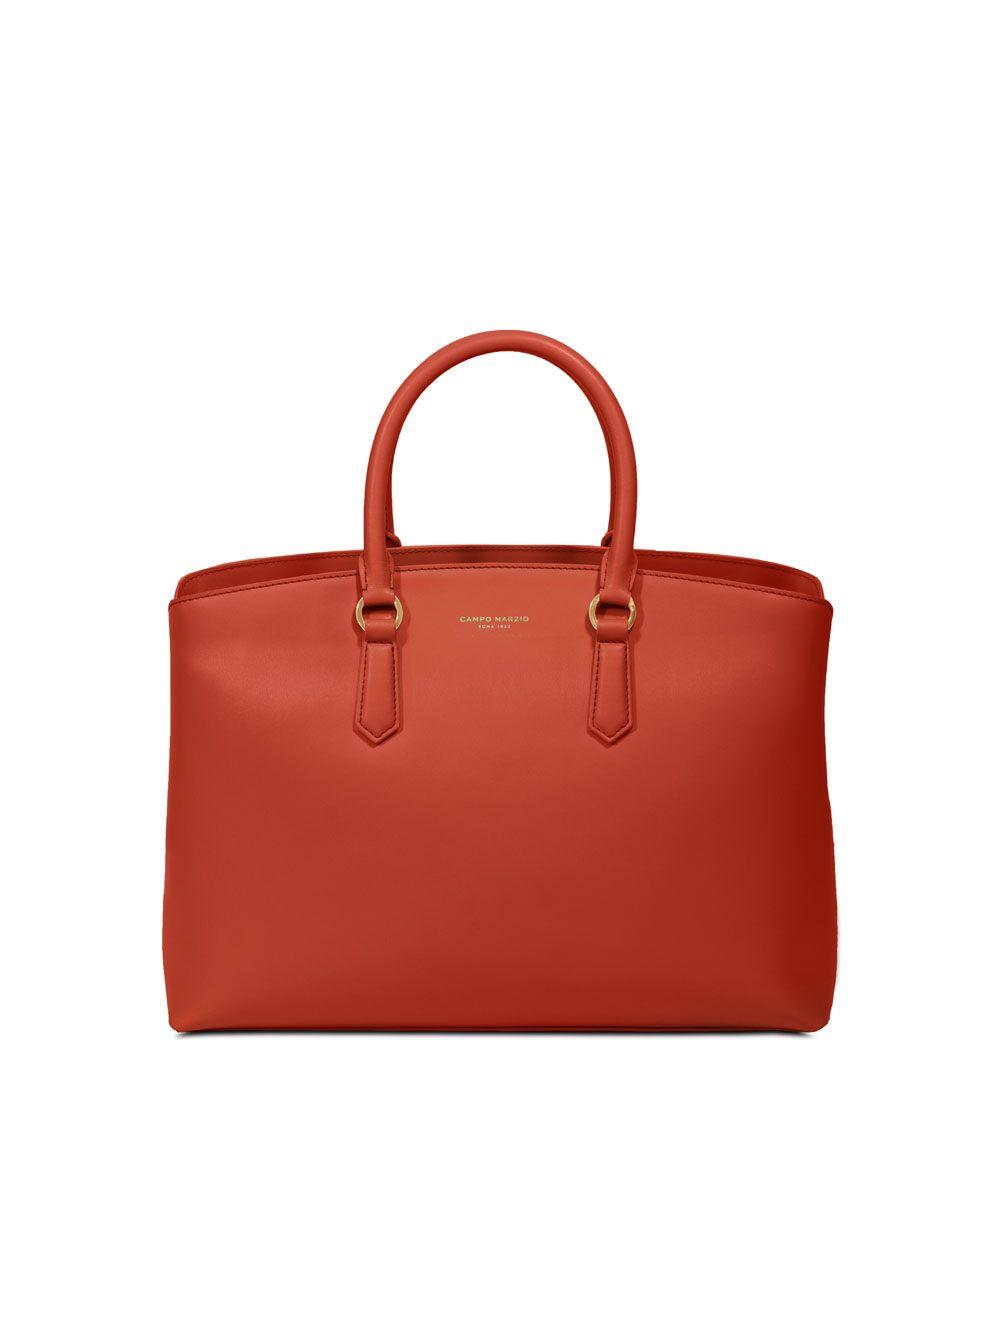 Professional Bag Double Handle